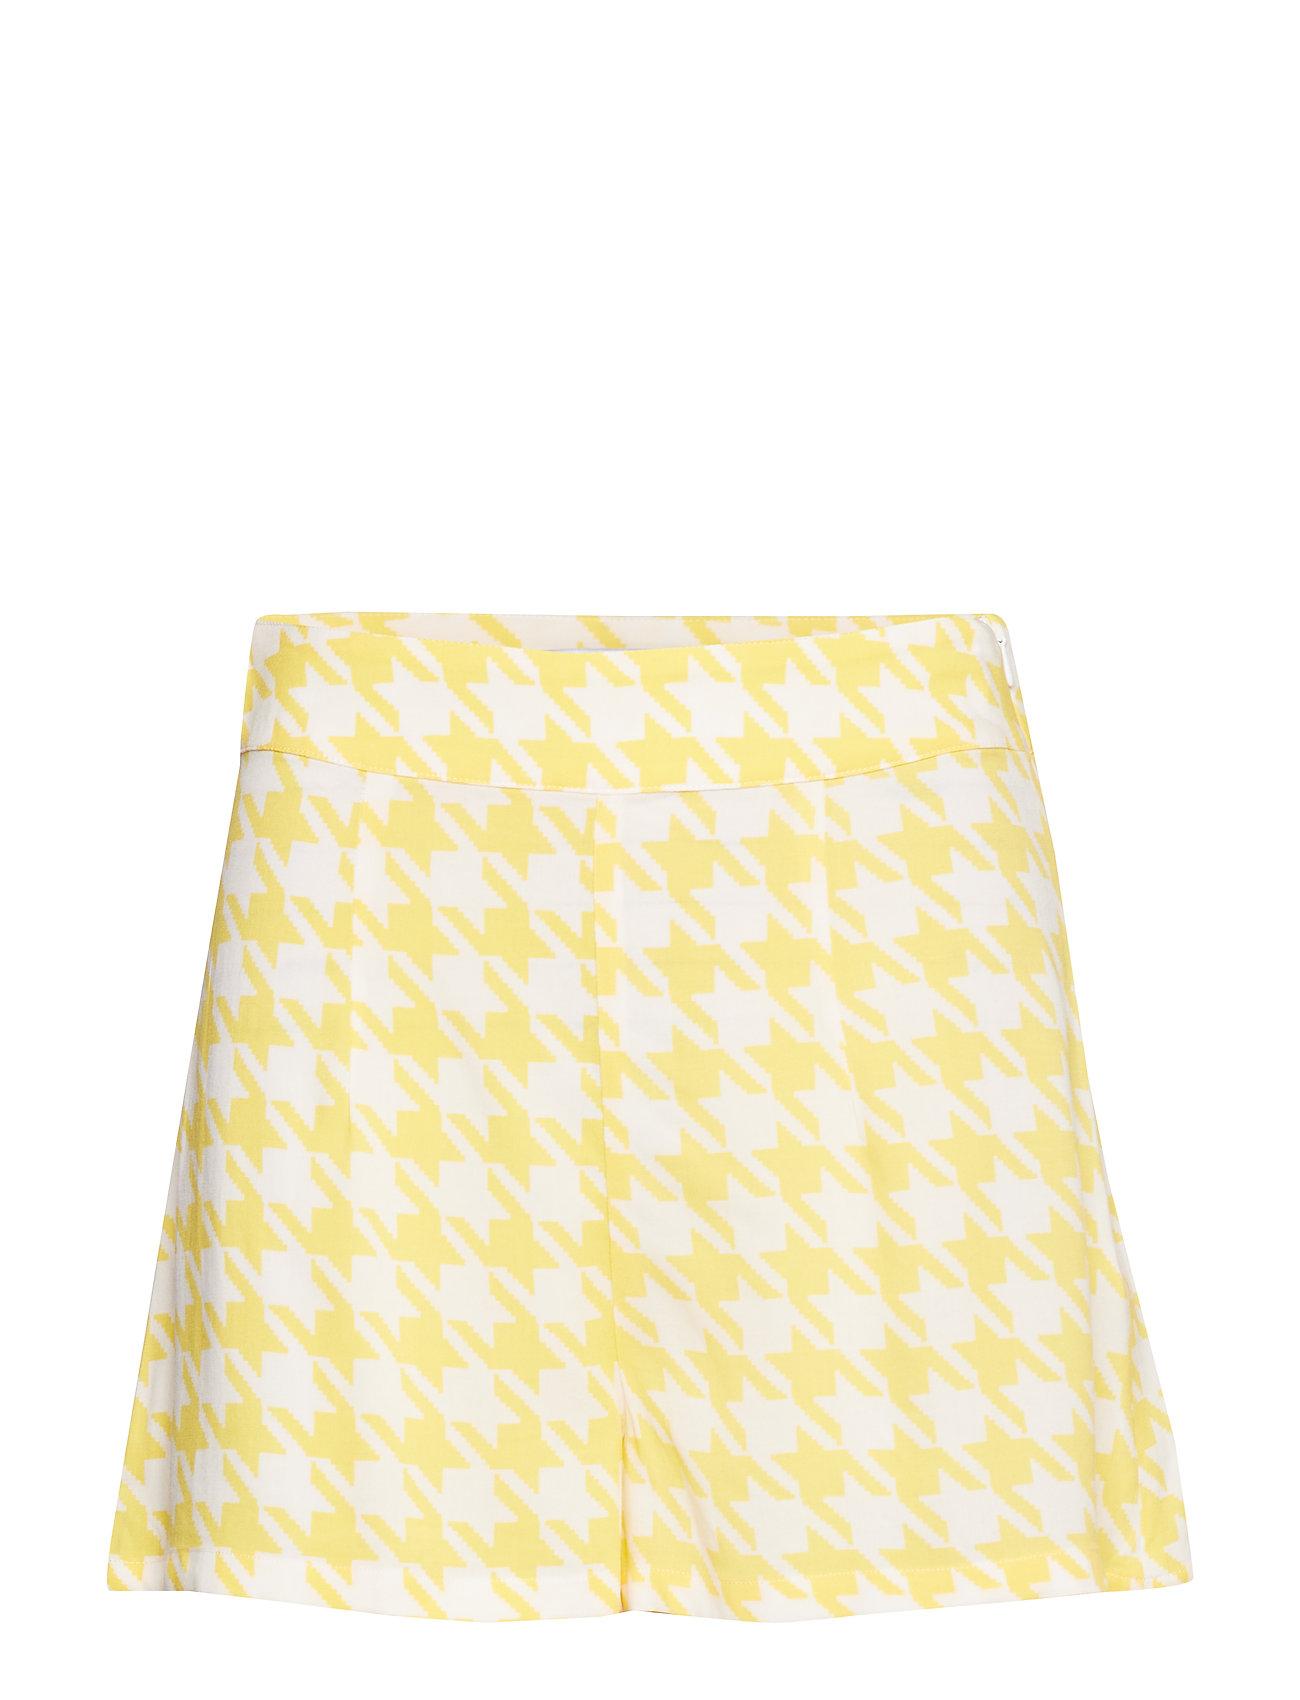 Ivyrevel Woven Shorts - YELLOW PEPITA PRINT